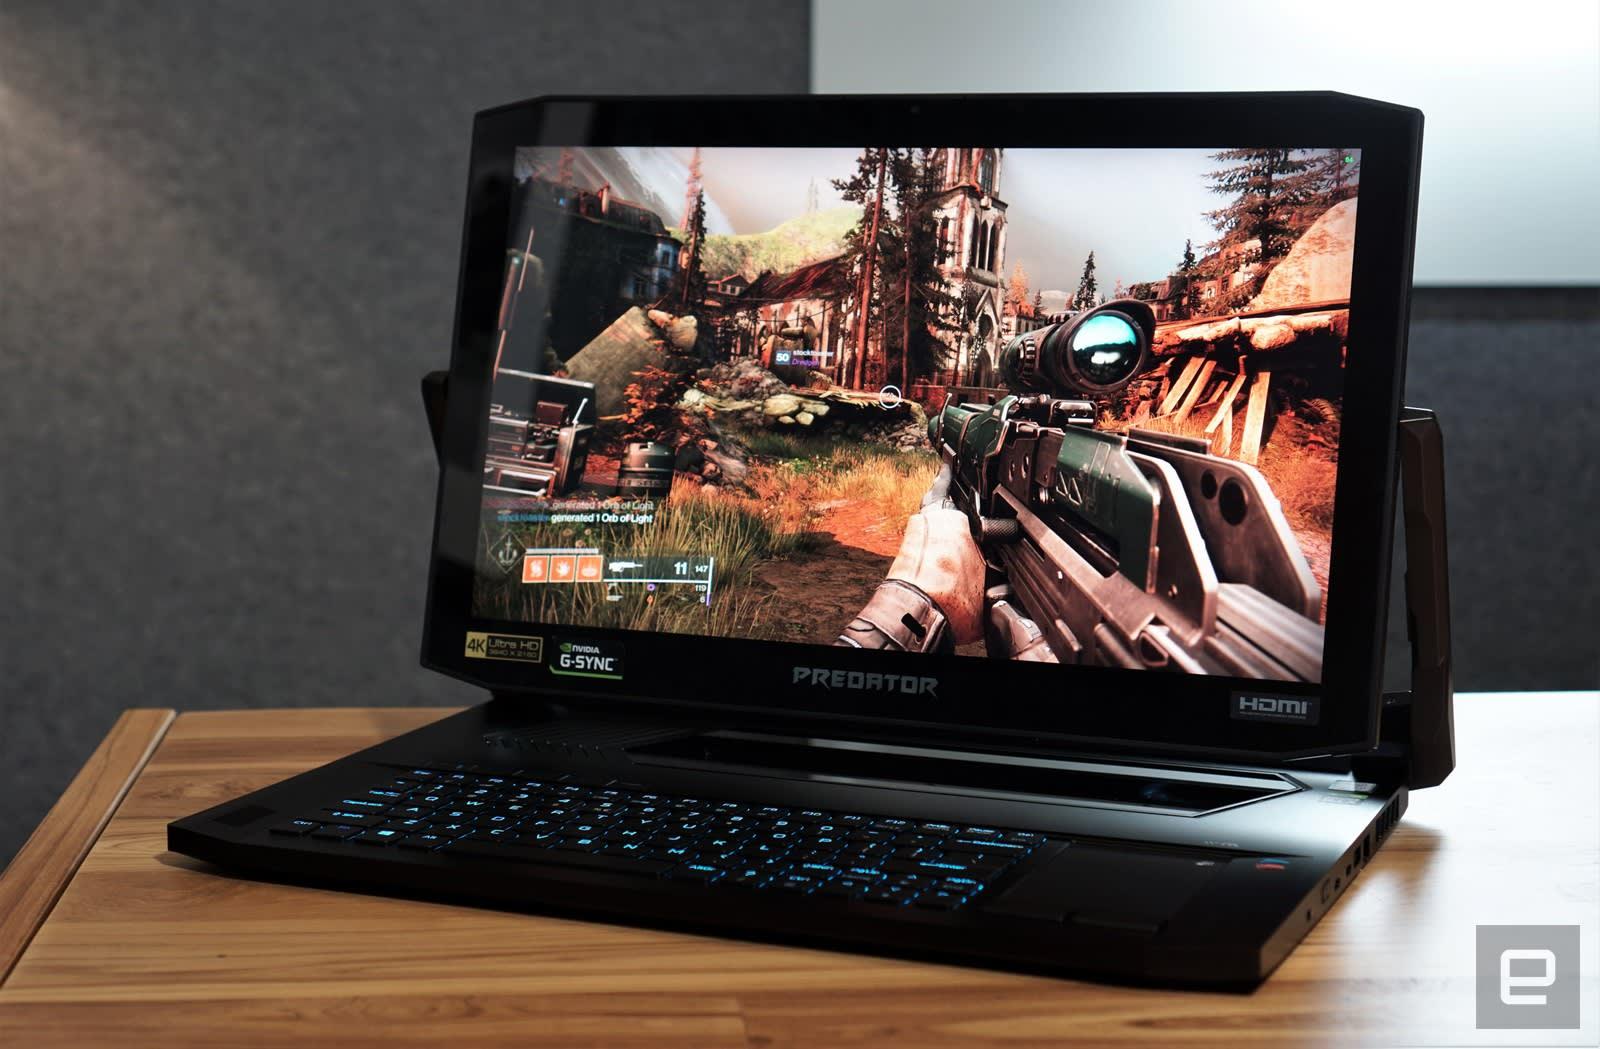 Acer Predator Triton 900 review: Who needs a crazy swiveling screen?